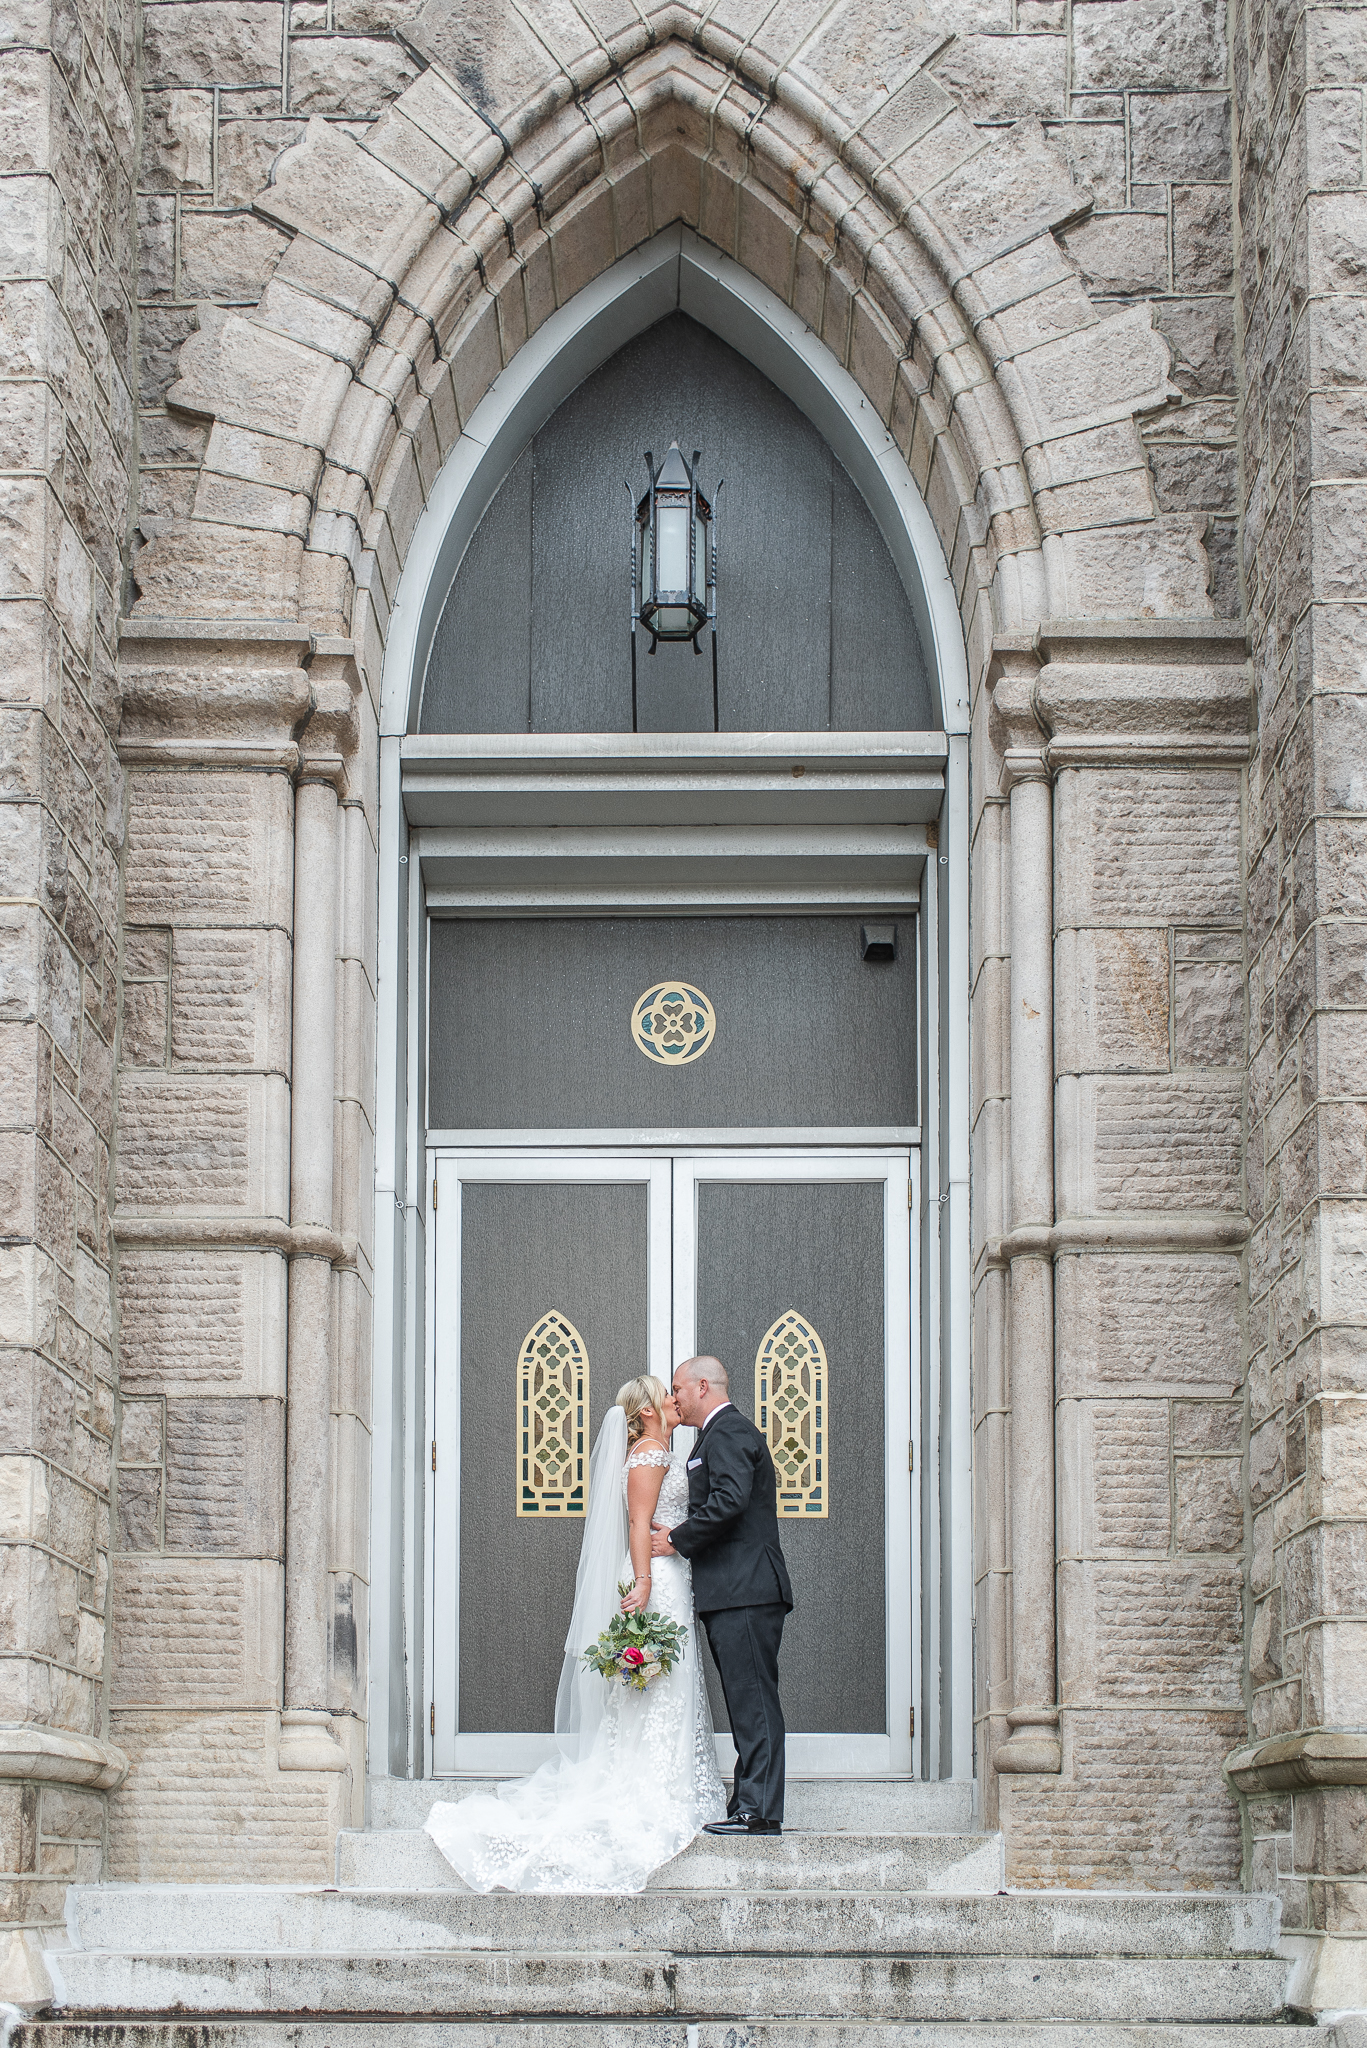 09_06_2019_Dana_Slifer_Photography_Casey_and_Adam_Wedding_09.jpg